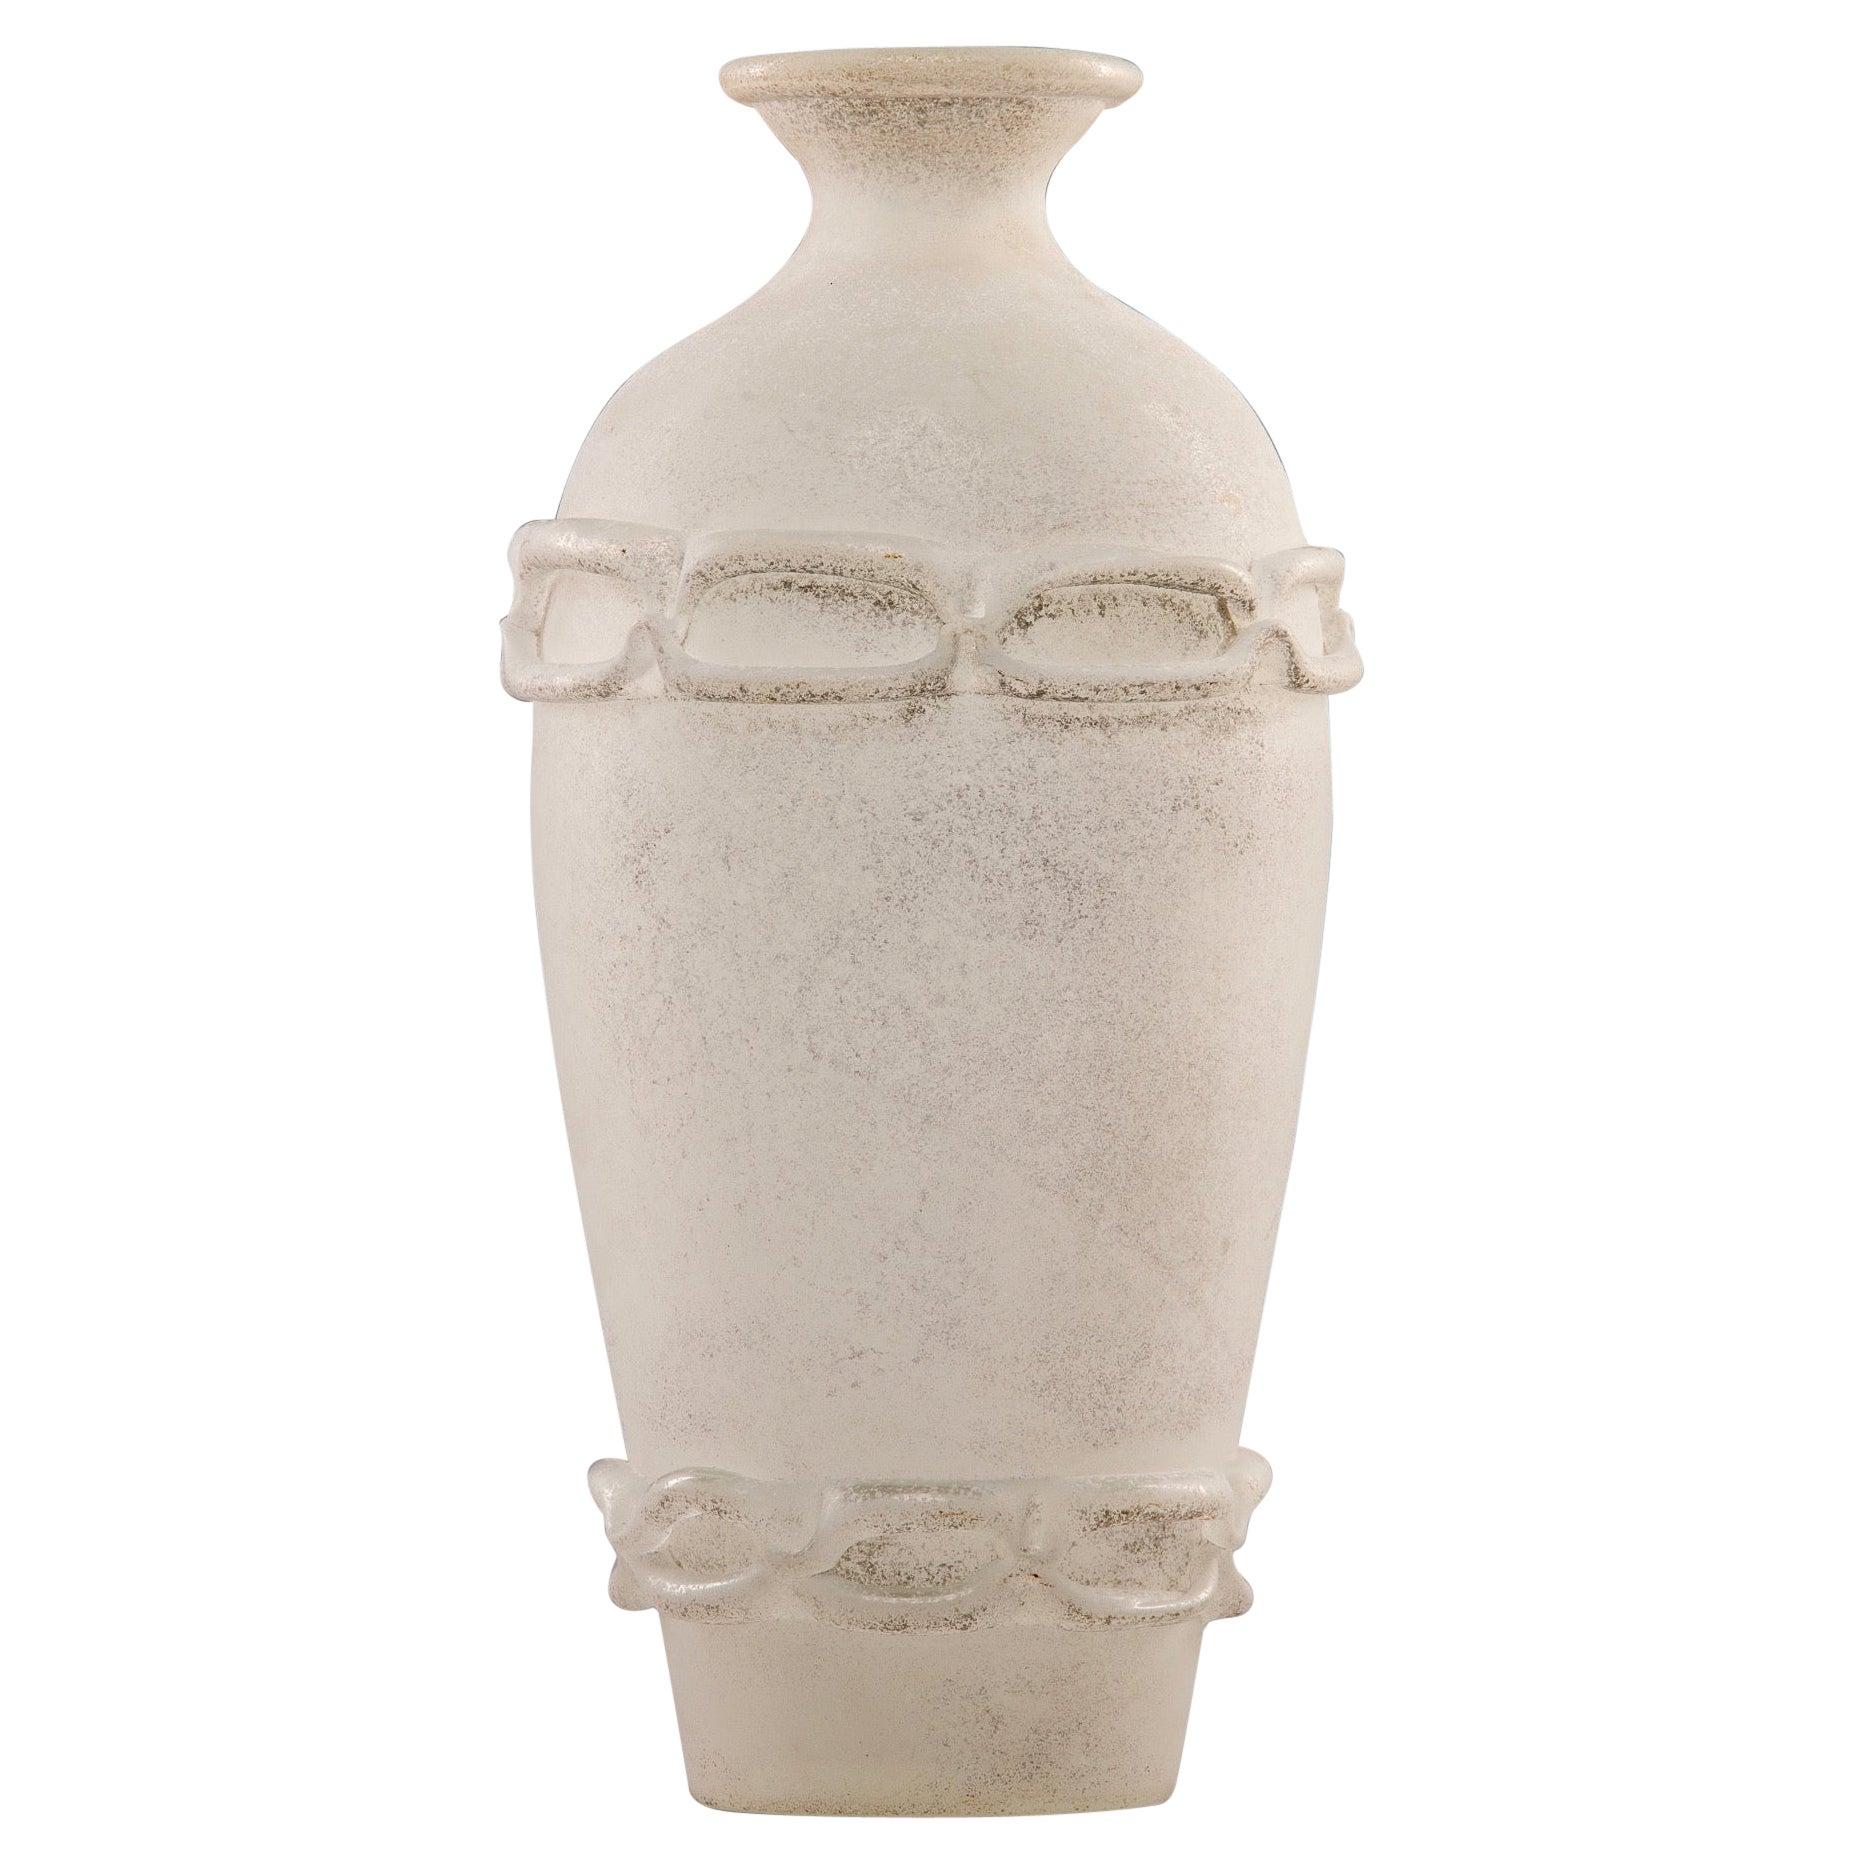 Tall Signed Seguso Scavo Style White Murano Glass Vase